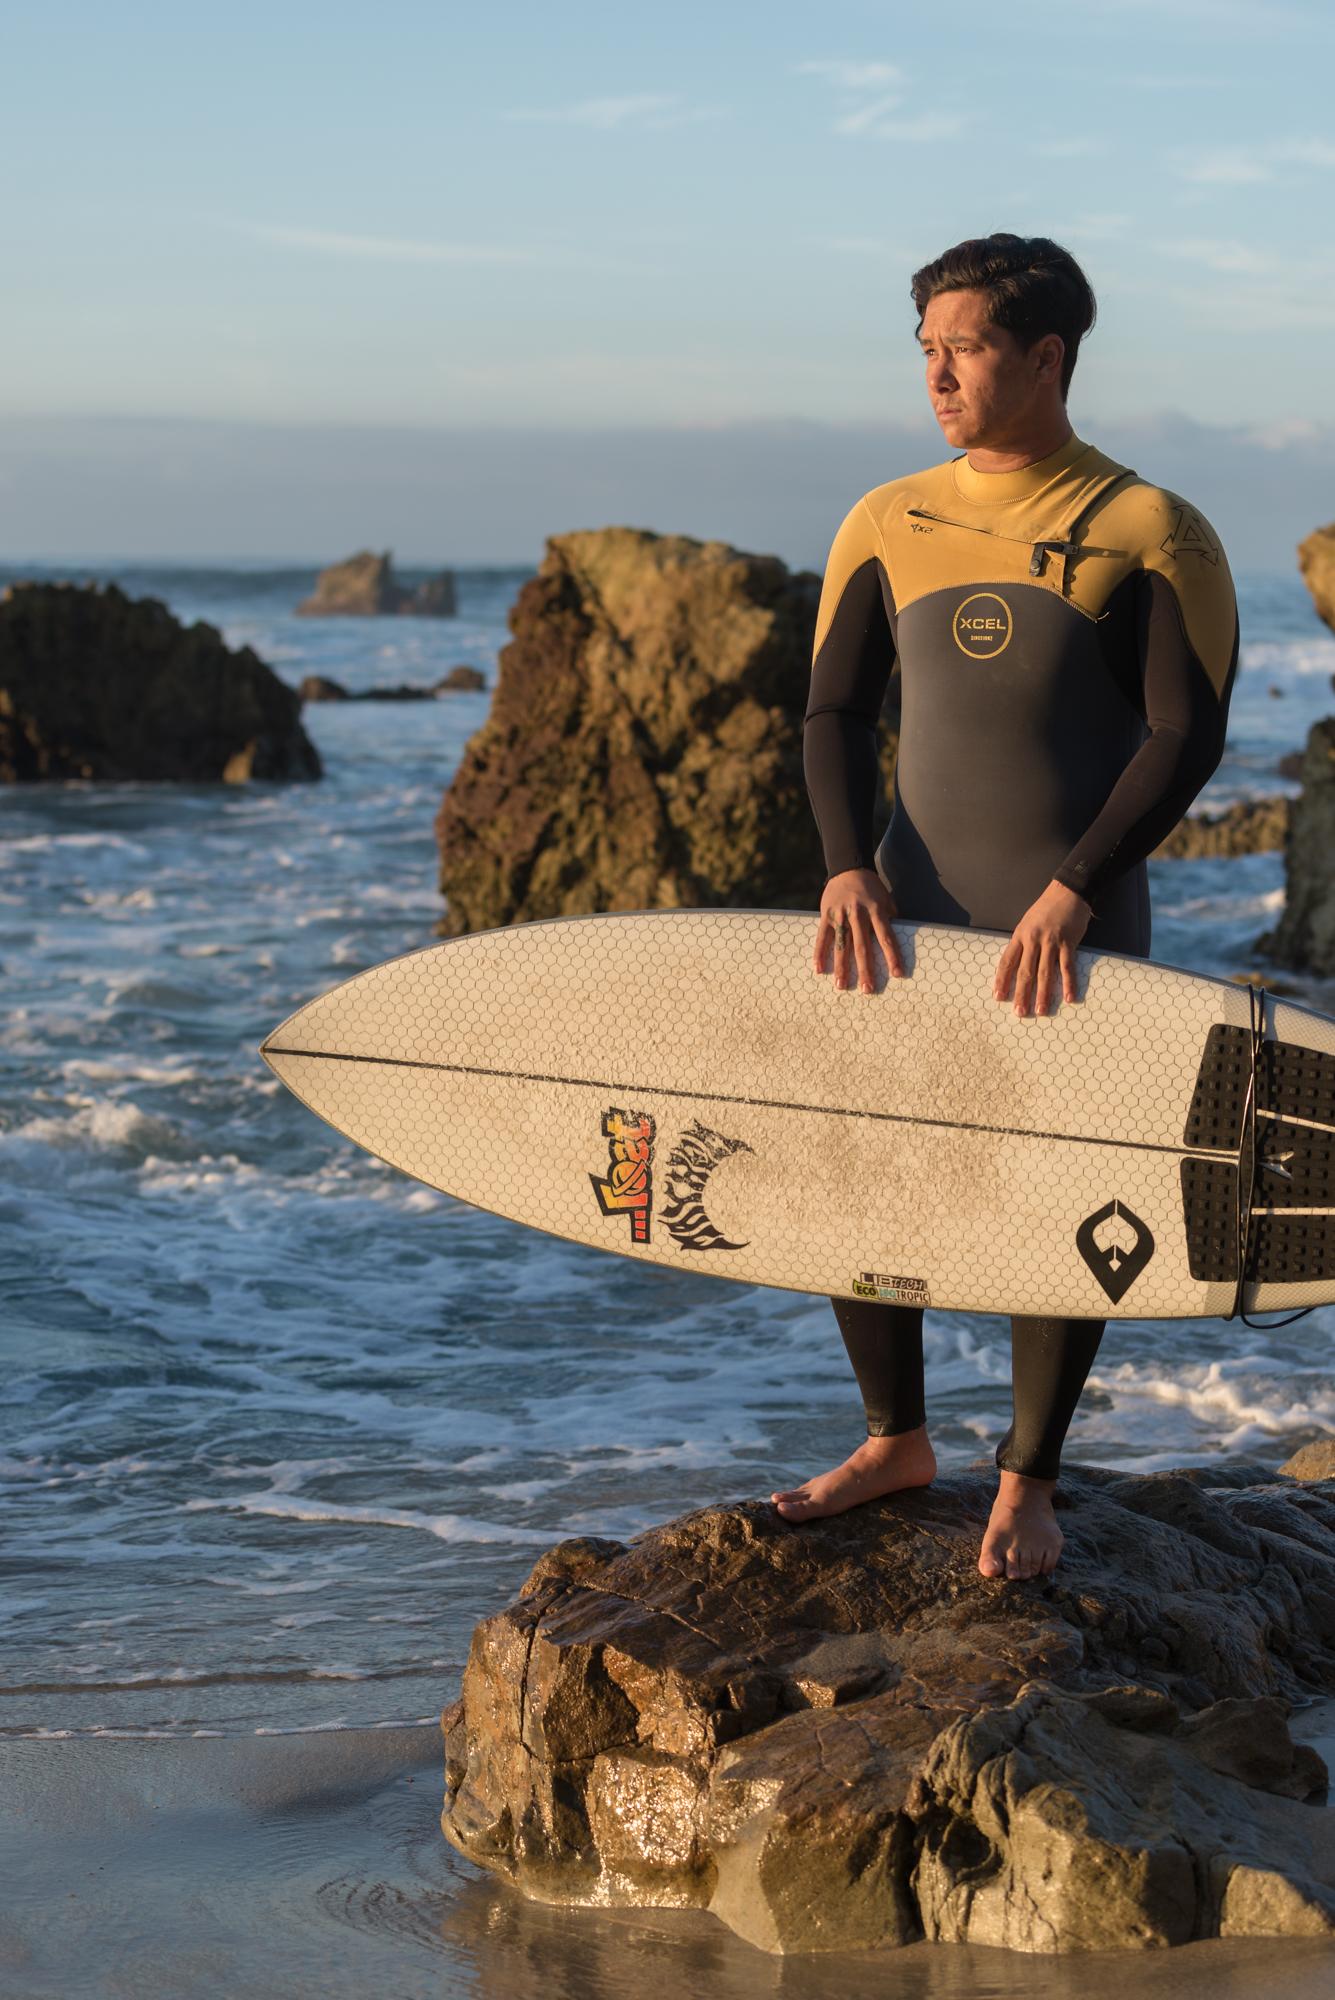 Surfer-Environmental-Portrait_Active-Lifestyle-Photography002.JPG